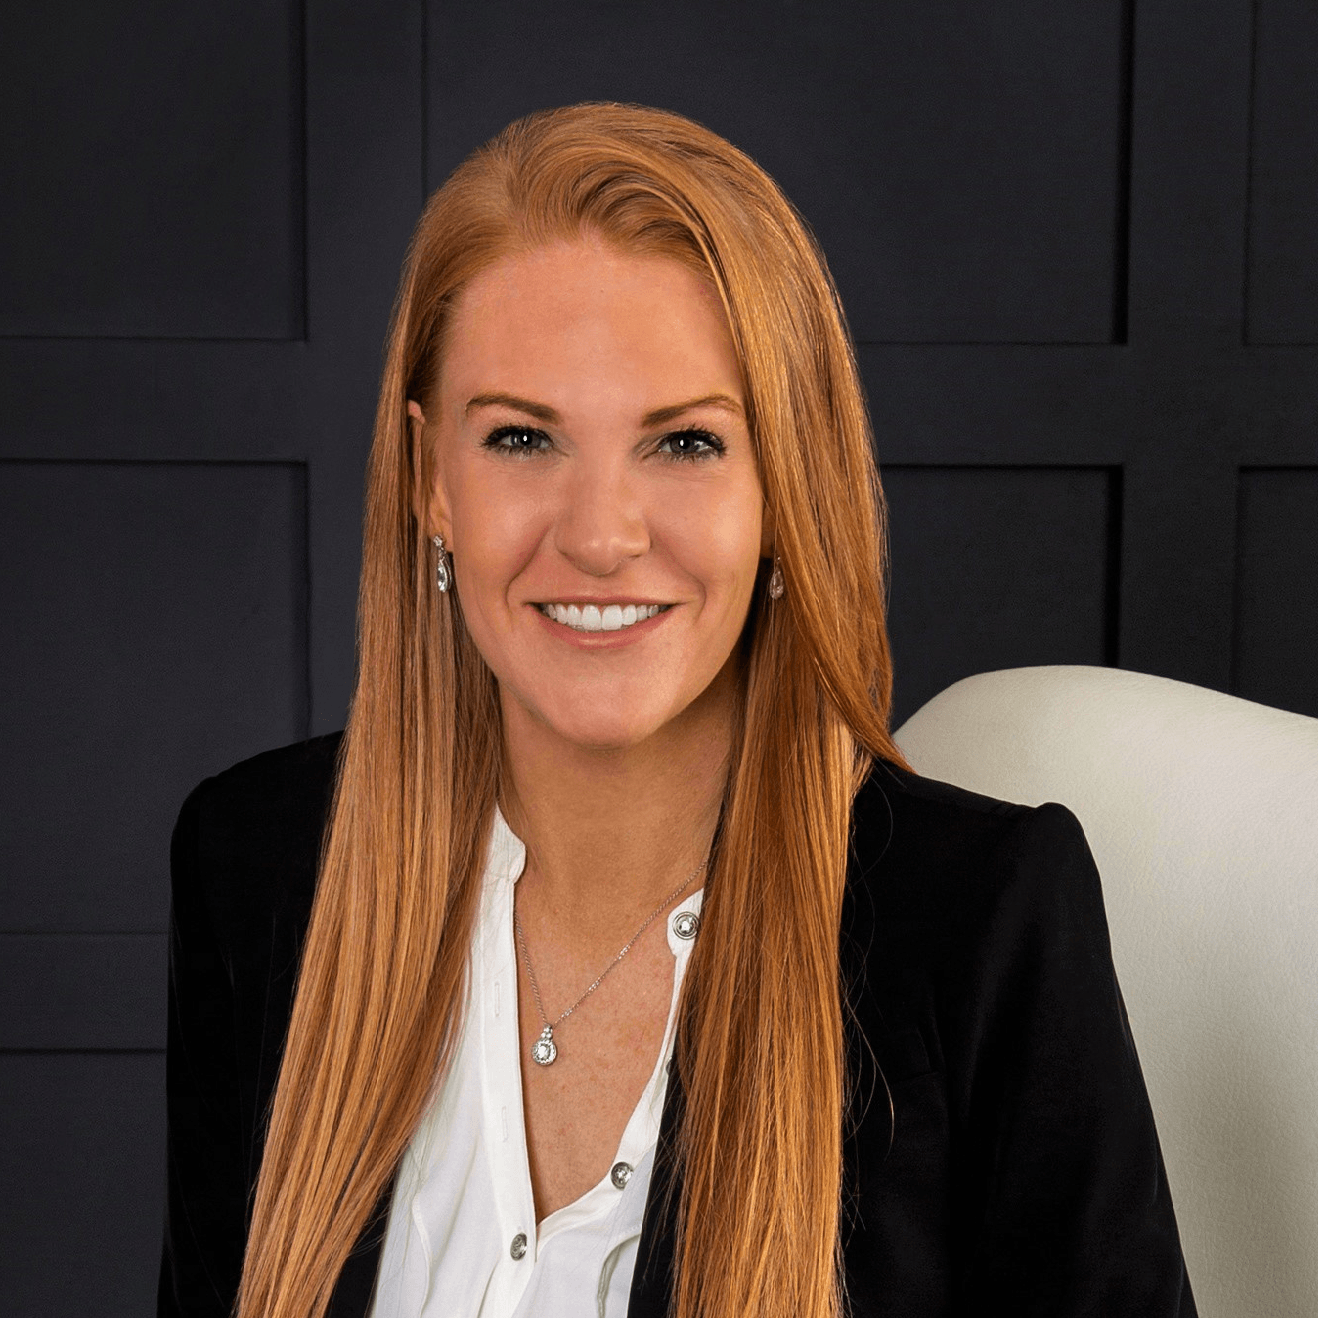 Hanah Rasmussen